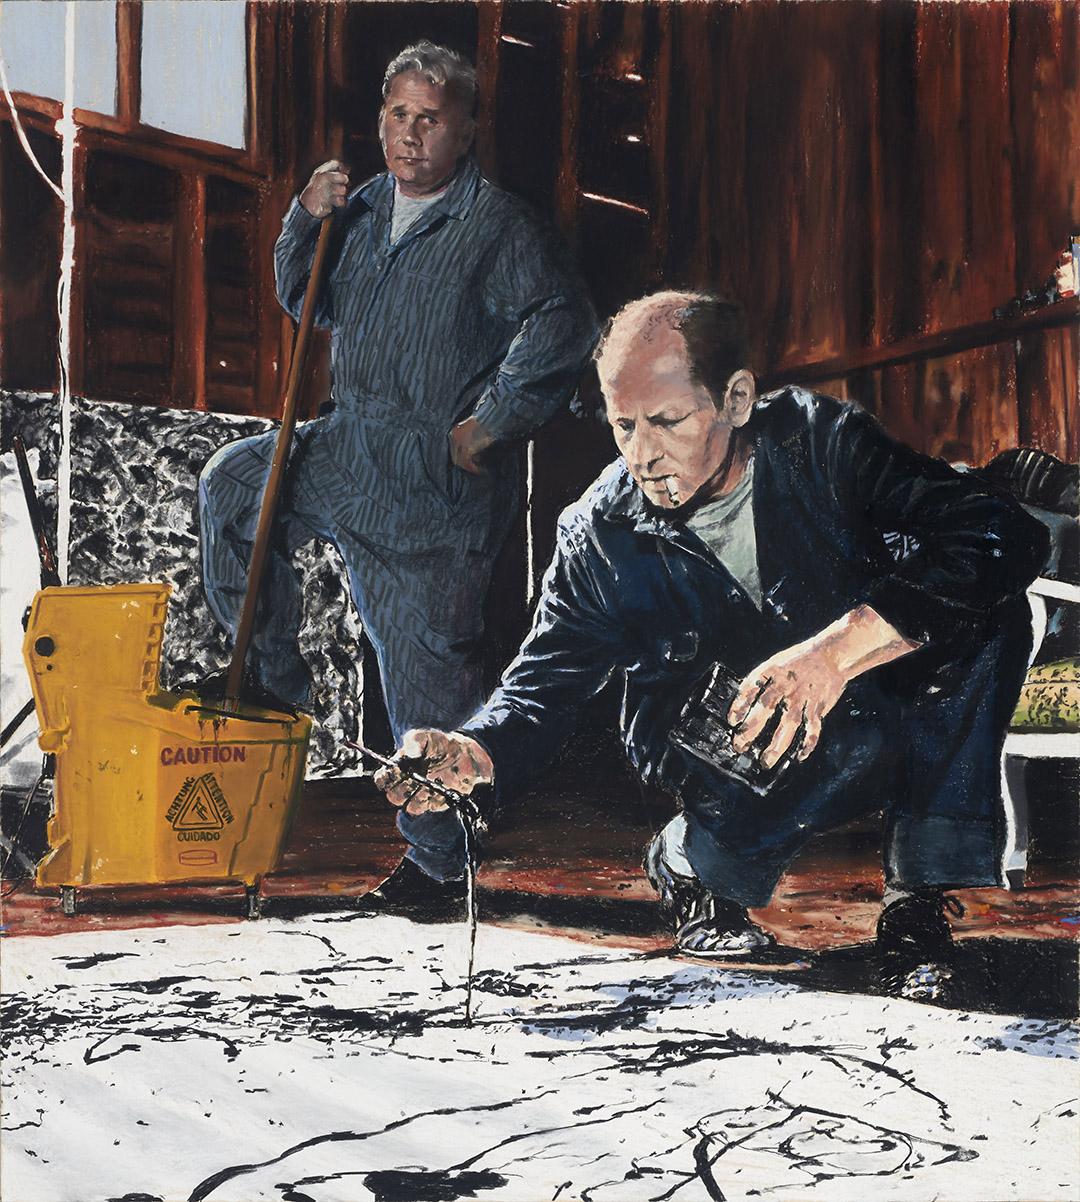 Eric Yahnker - Los Angeles, CA artist